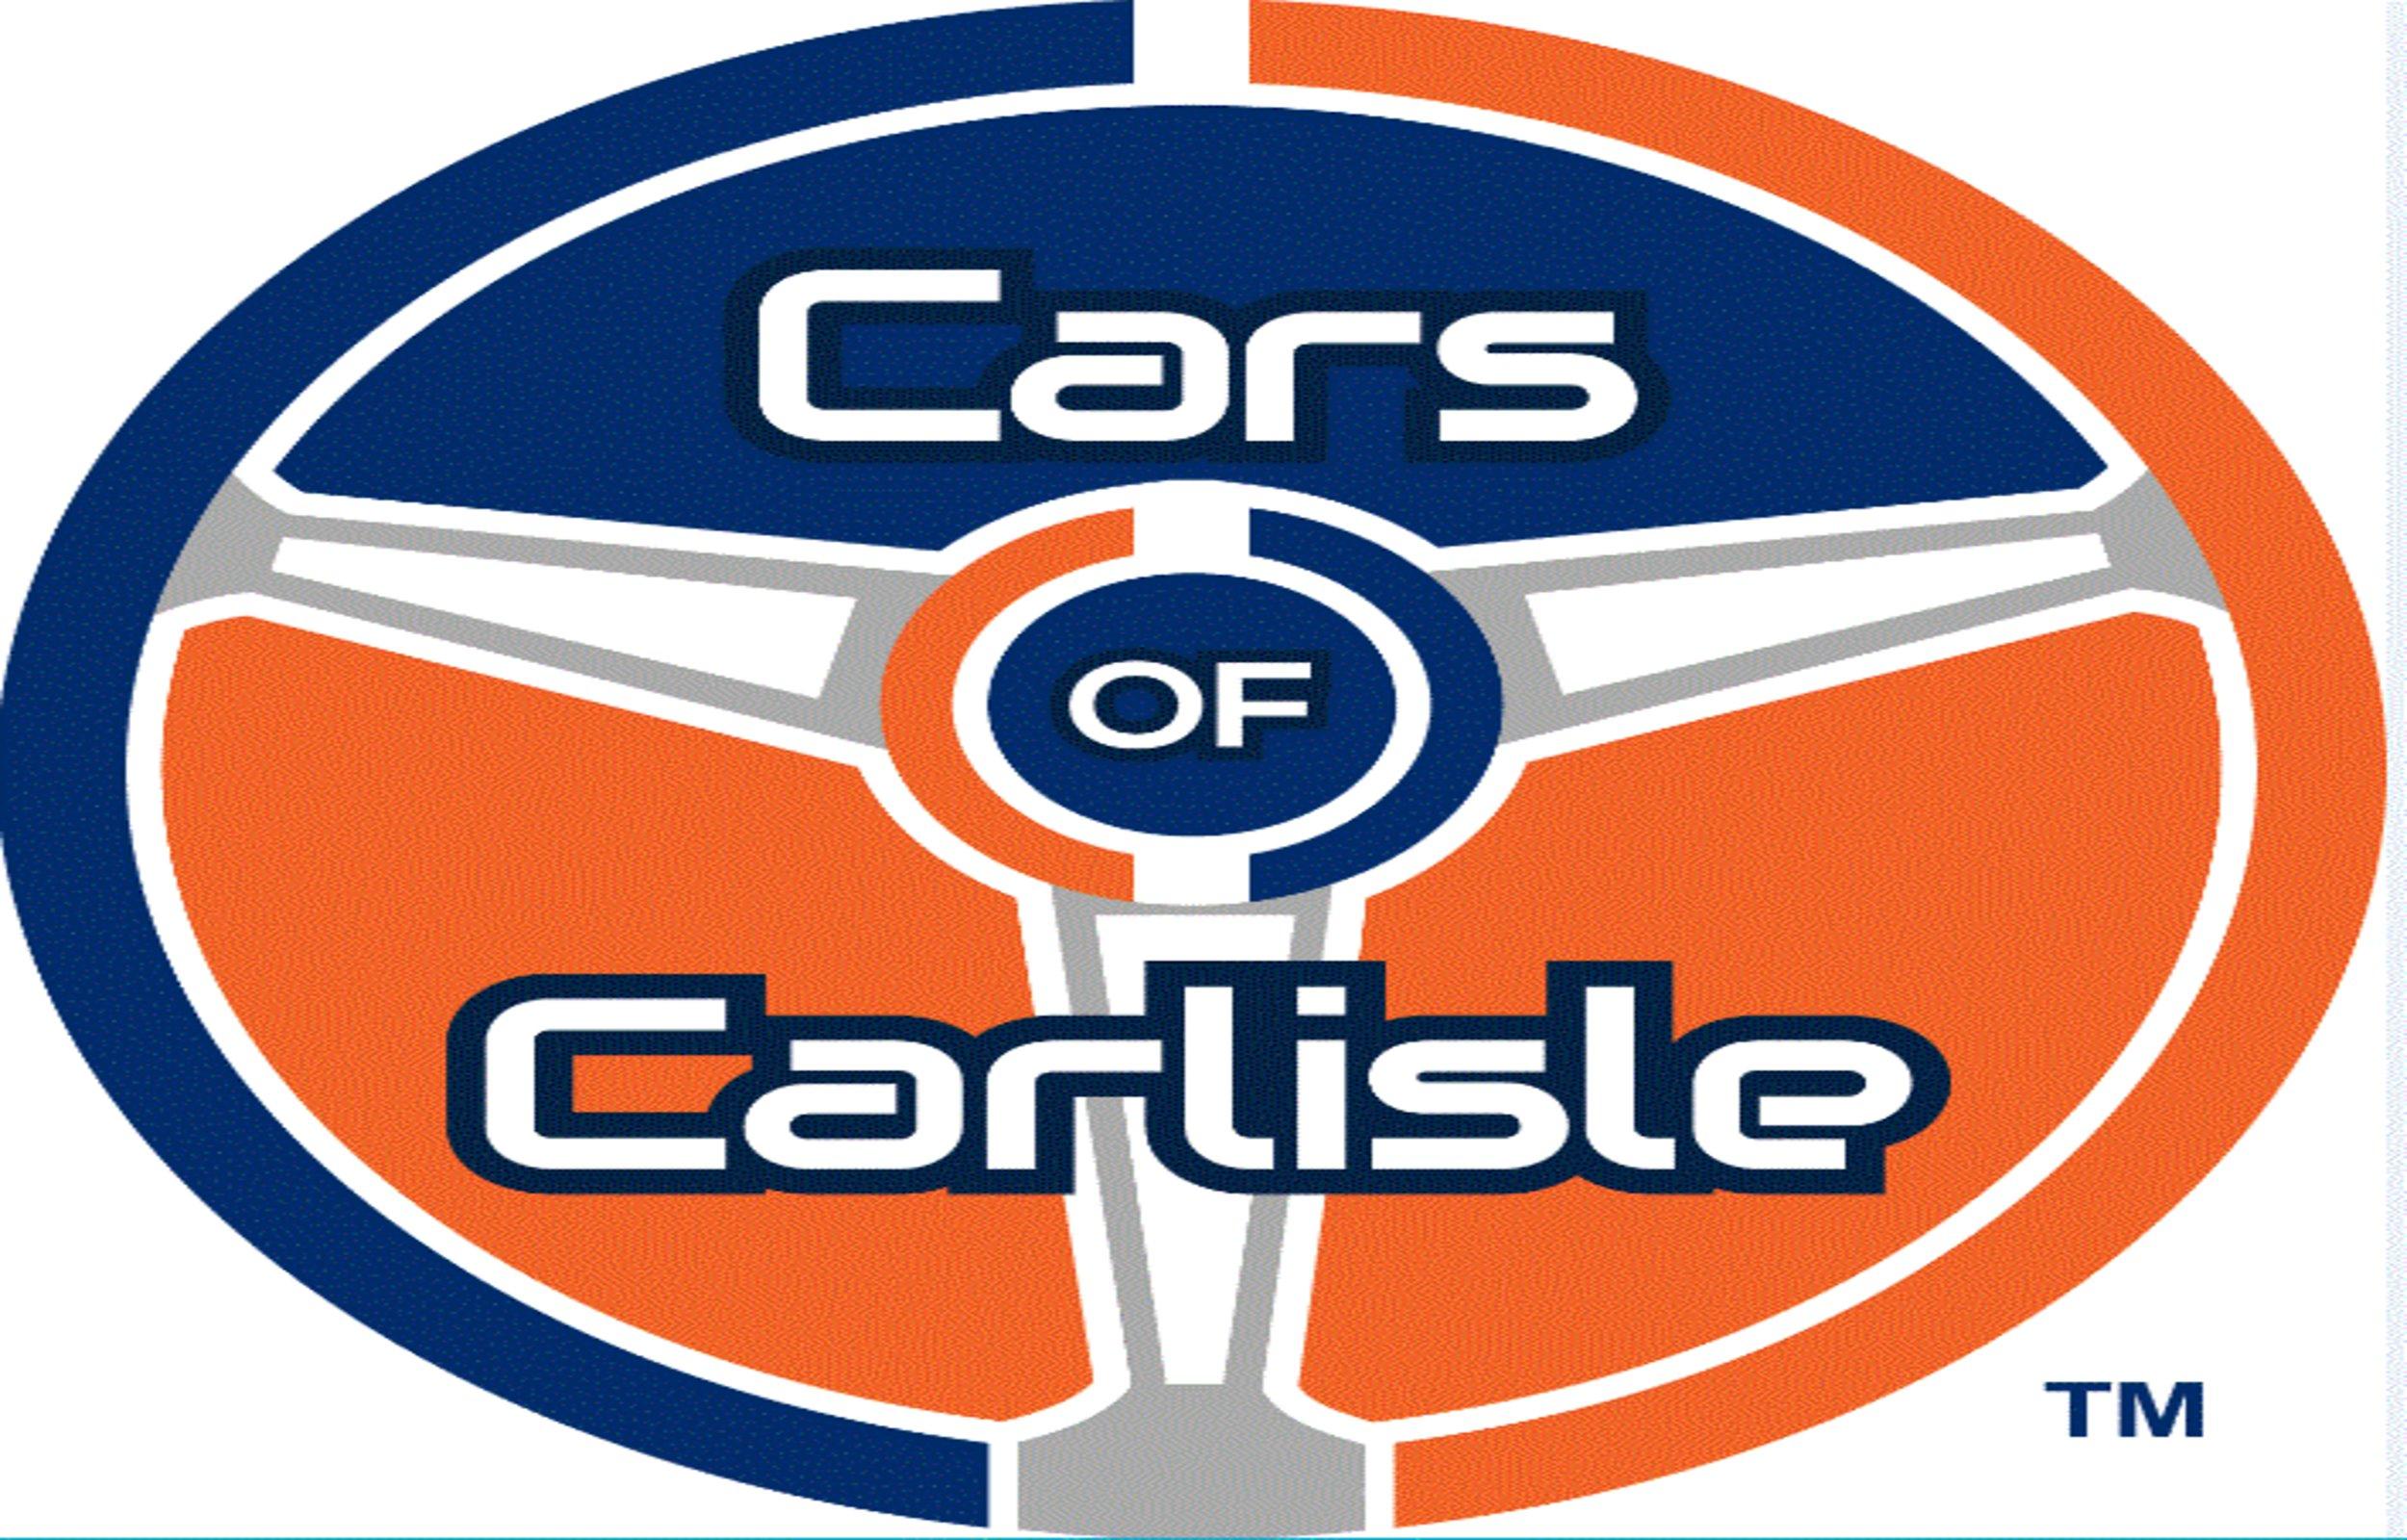 Cars Of Carlisle - Carlisle pa car show 2018